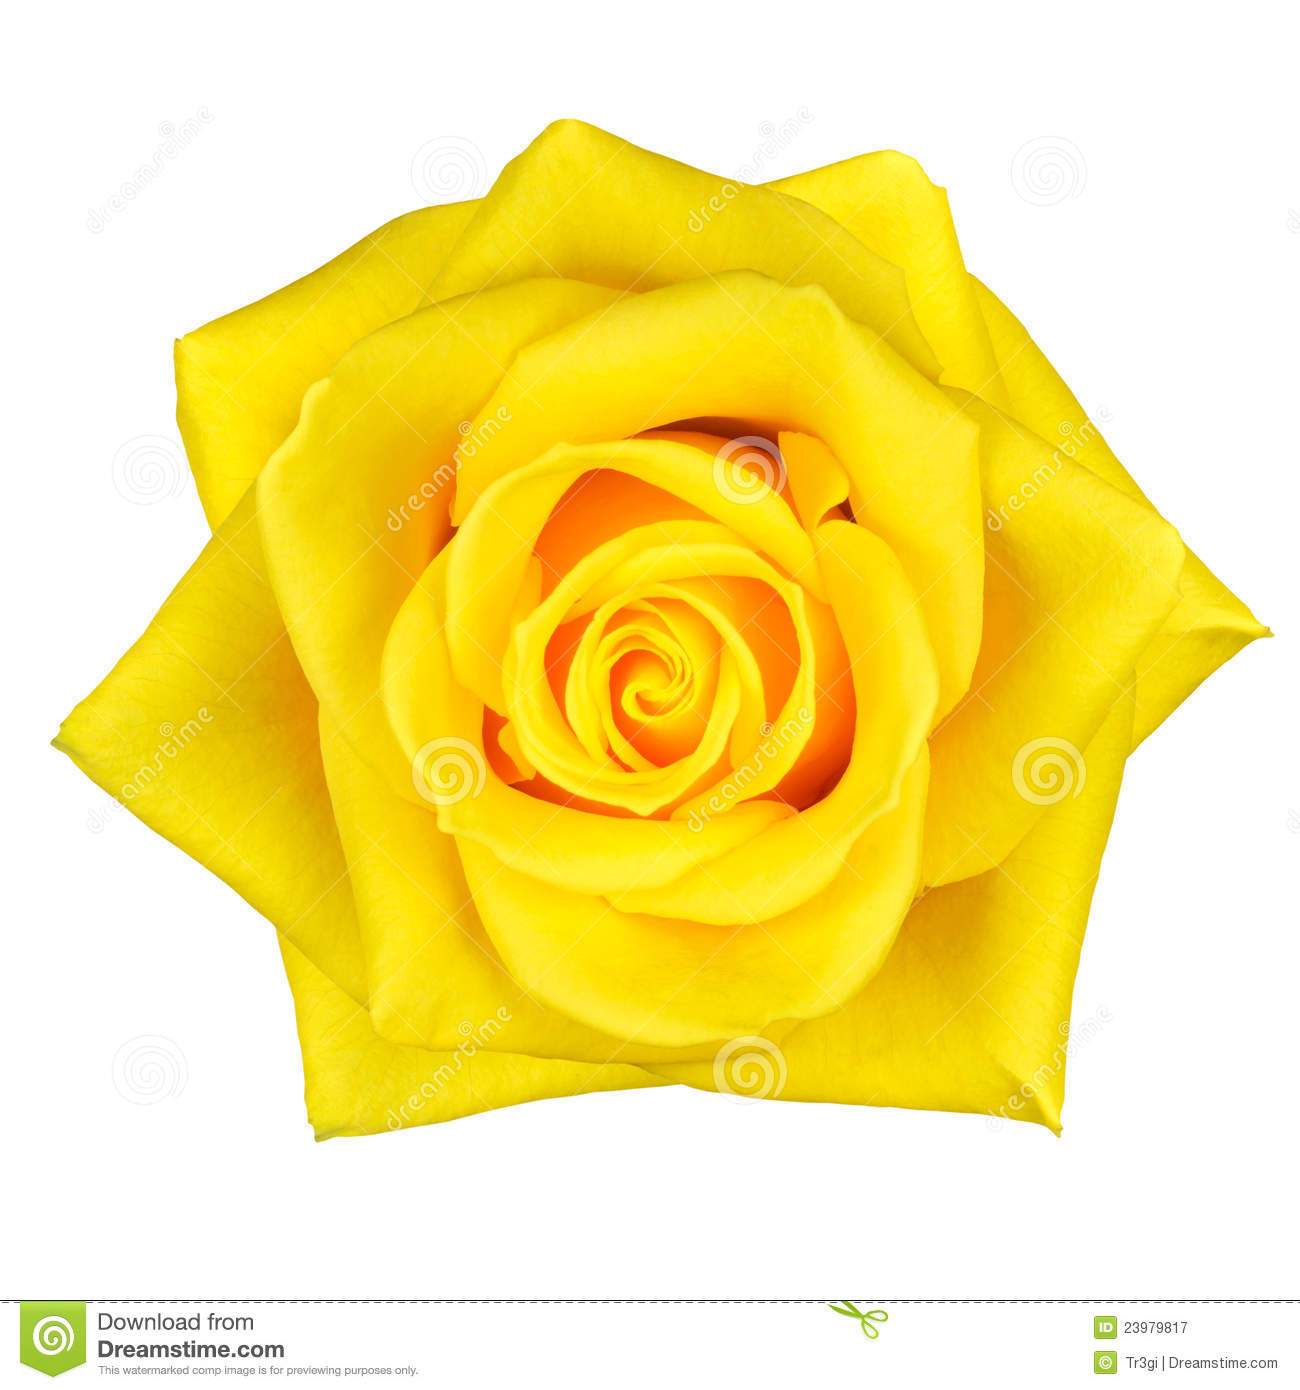 Yellow Rose Images Clip Art Beautiful Ye-Yellow Rose Images Clip Art Beautiful Yellow Rose Flower-14